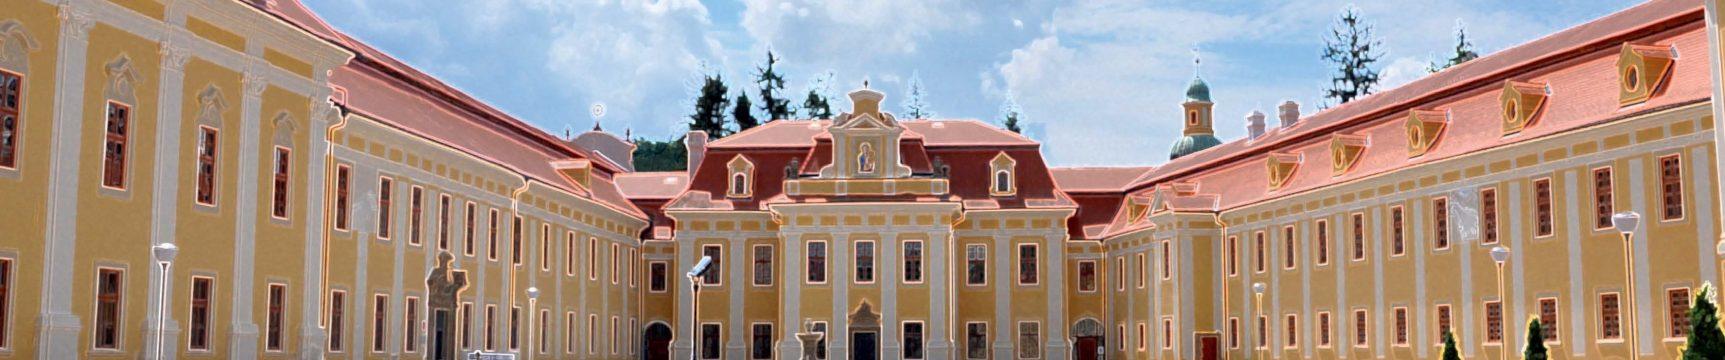 Stojanovo gymnázium Velehrad